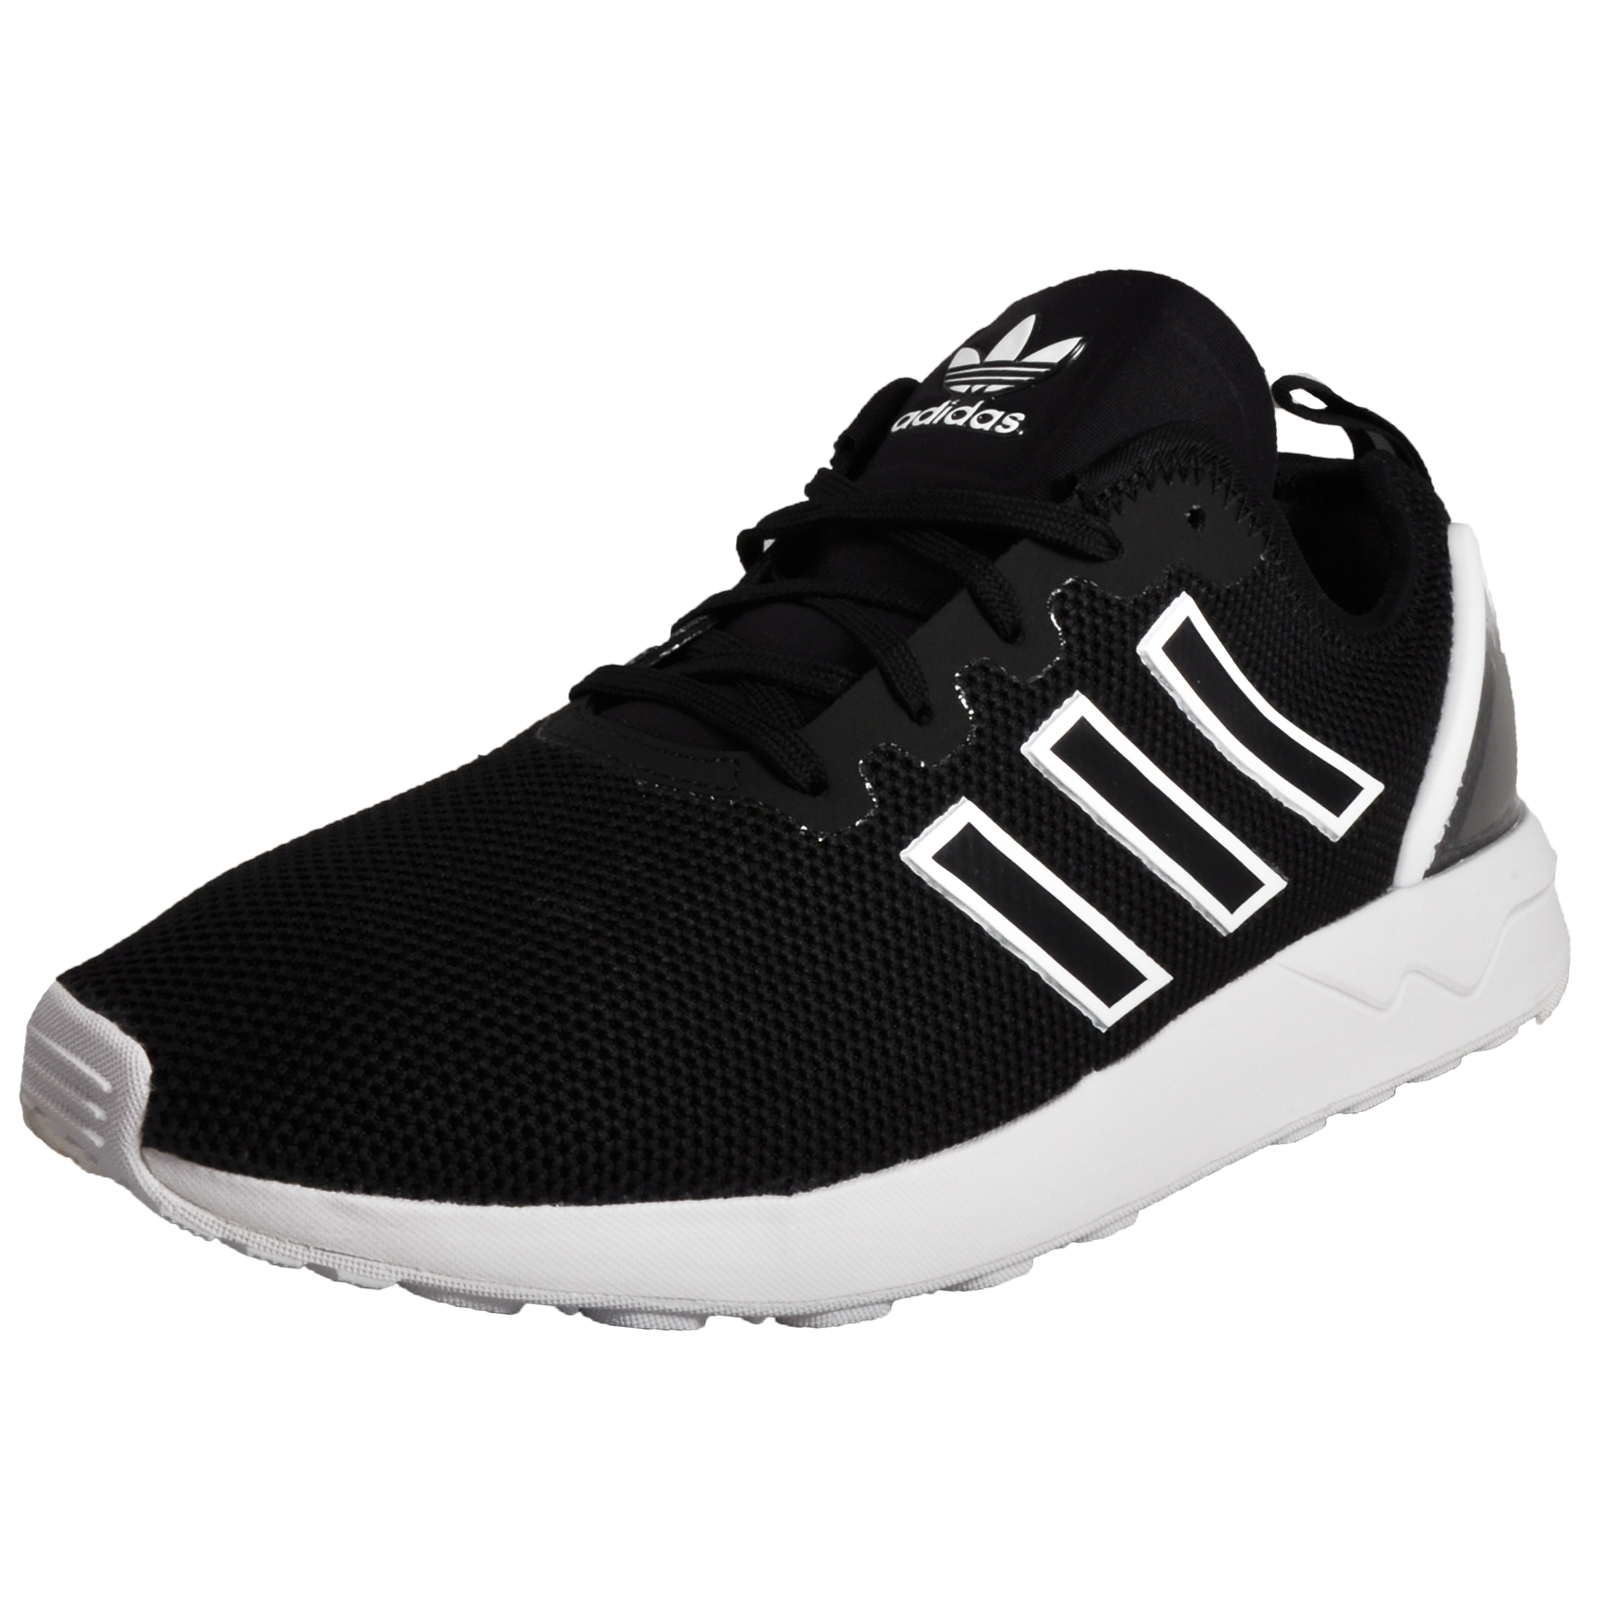 31f86a401e18d ... usa adidas originals zx flux adv junior retro running shoes trainers  black c4fa4 281c2